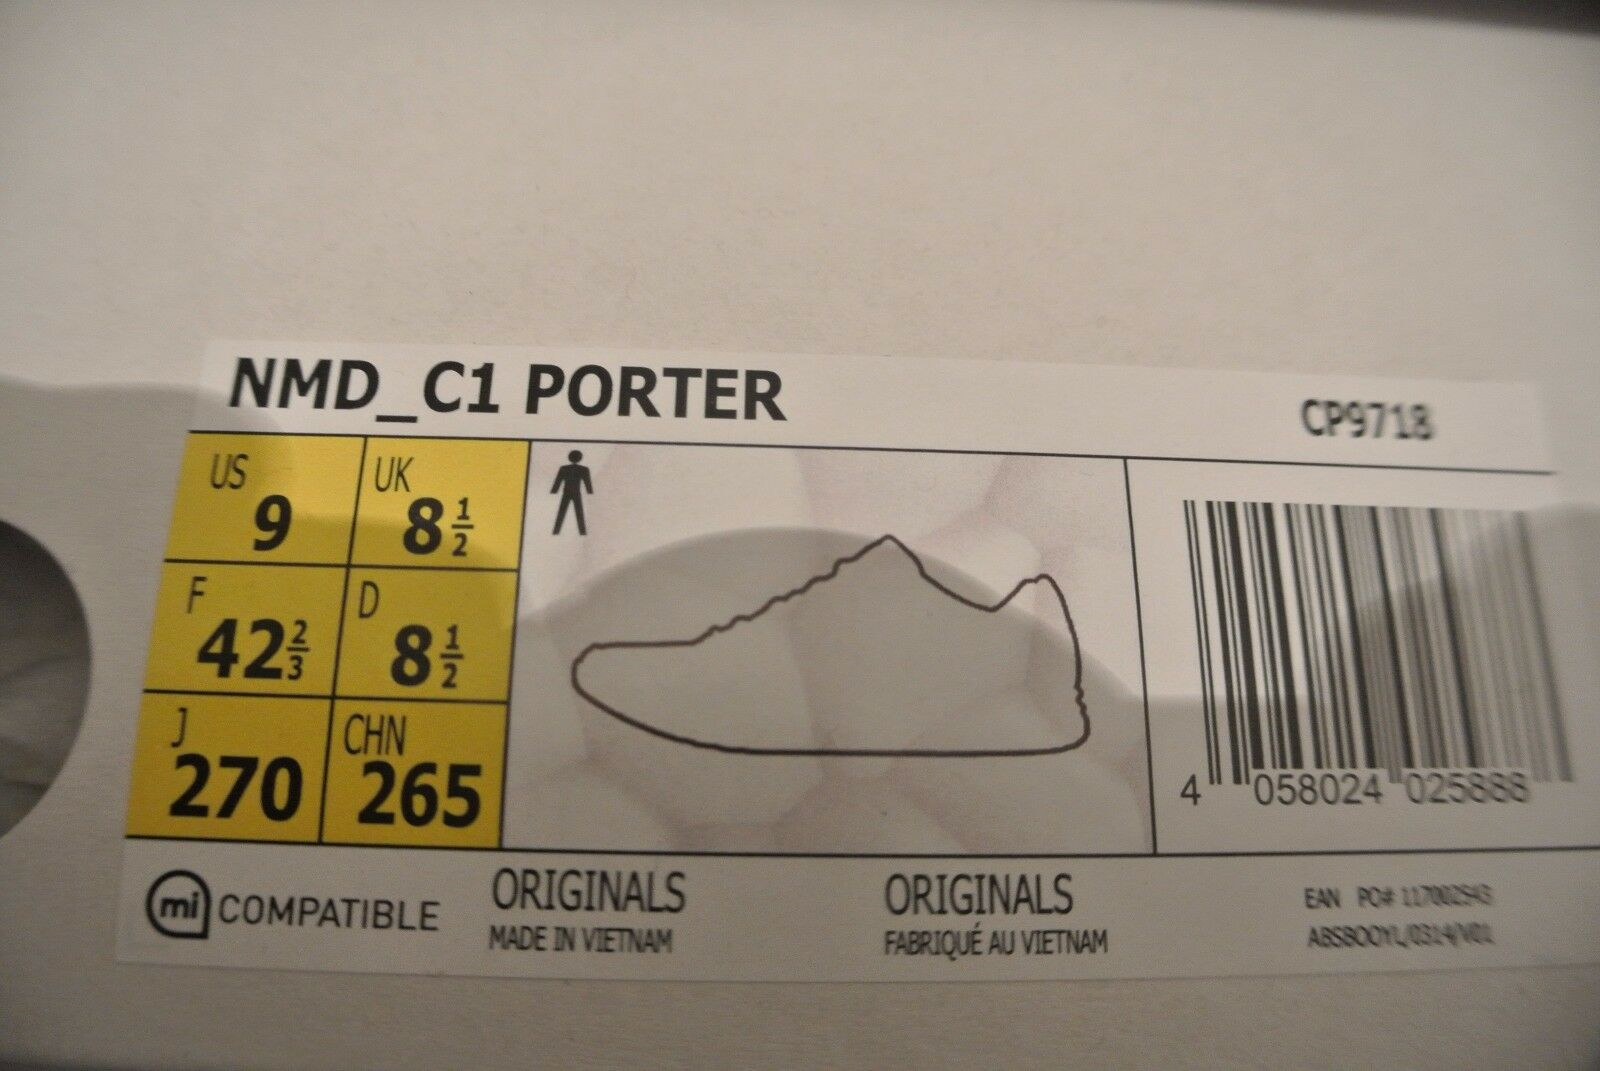 ADIDAS ADIDAS ADIDAS ORIGINALS BY PORTER NMD C1 CHUKKA BOOST +  NMD R1 PK PRIMEKNIT OG 42.5 ef61a2